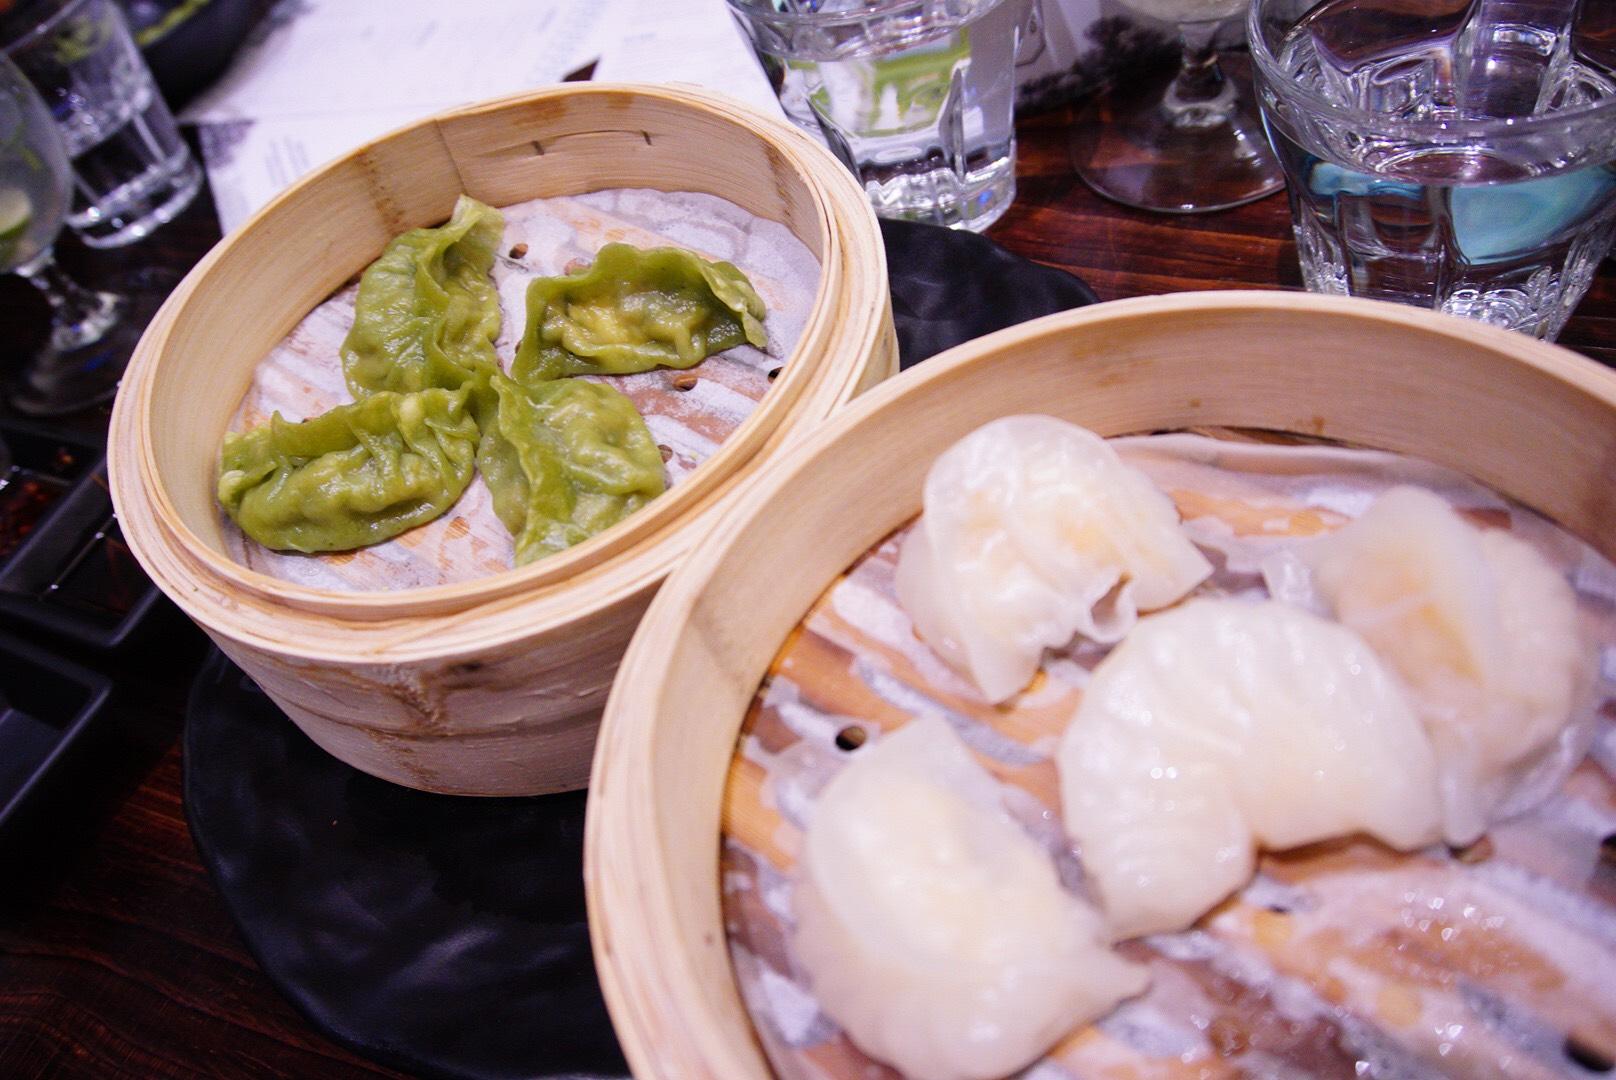 Miss Chow's Vegetarian Dumplings